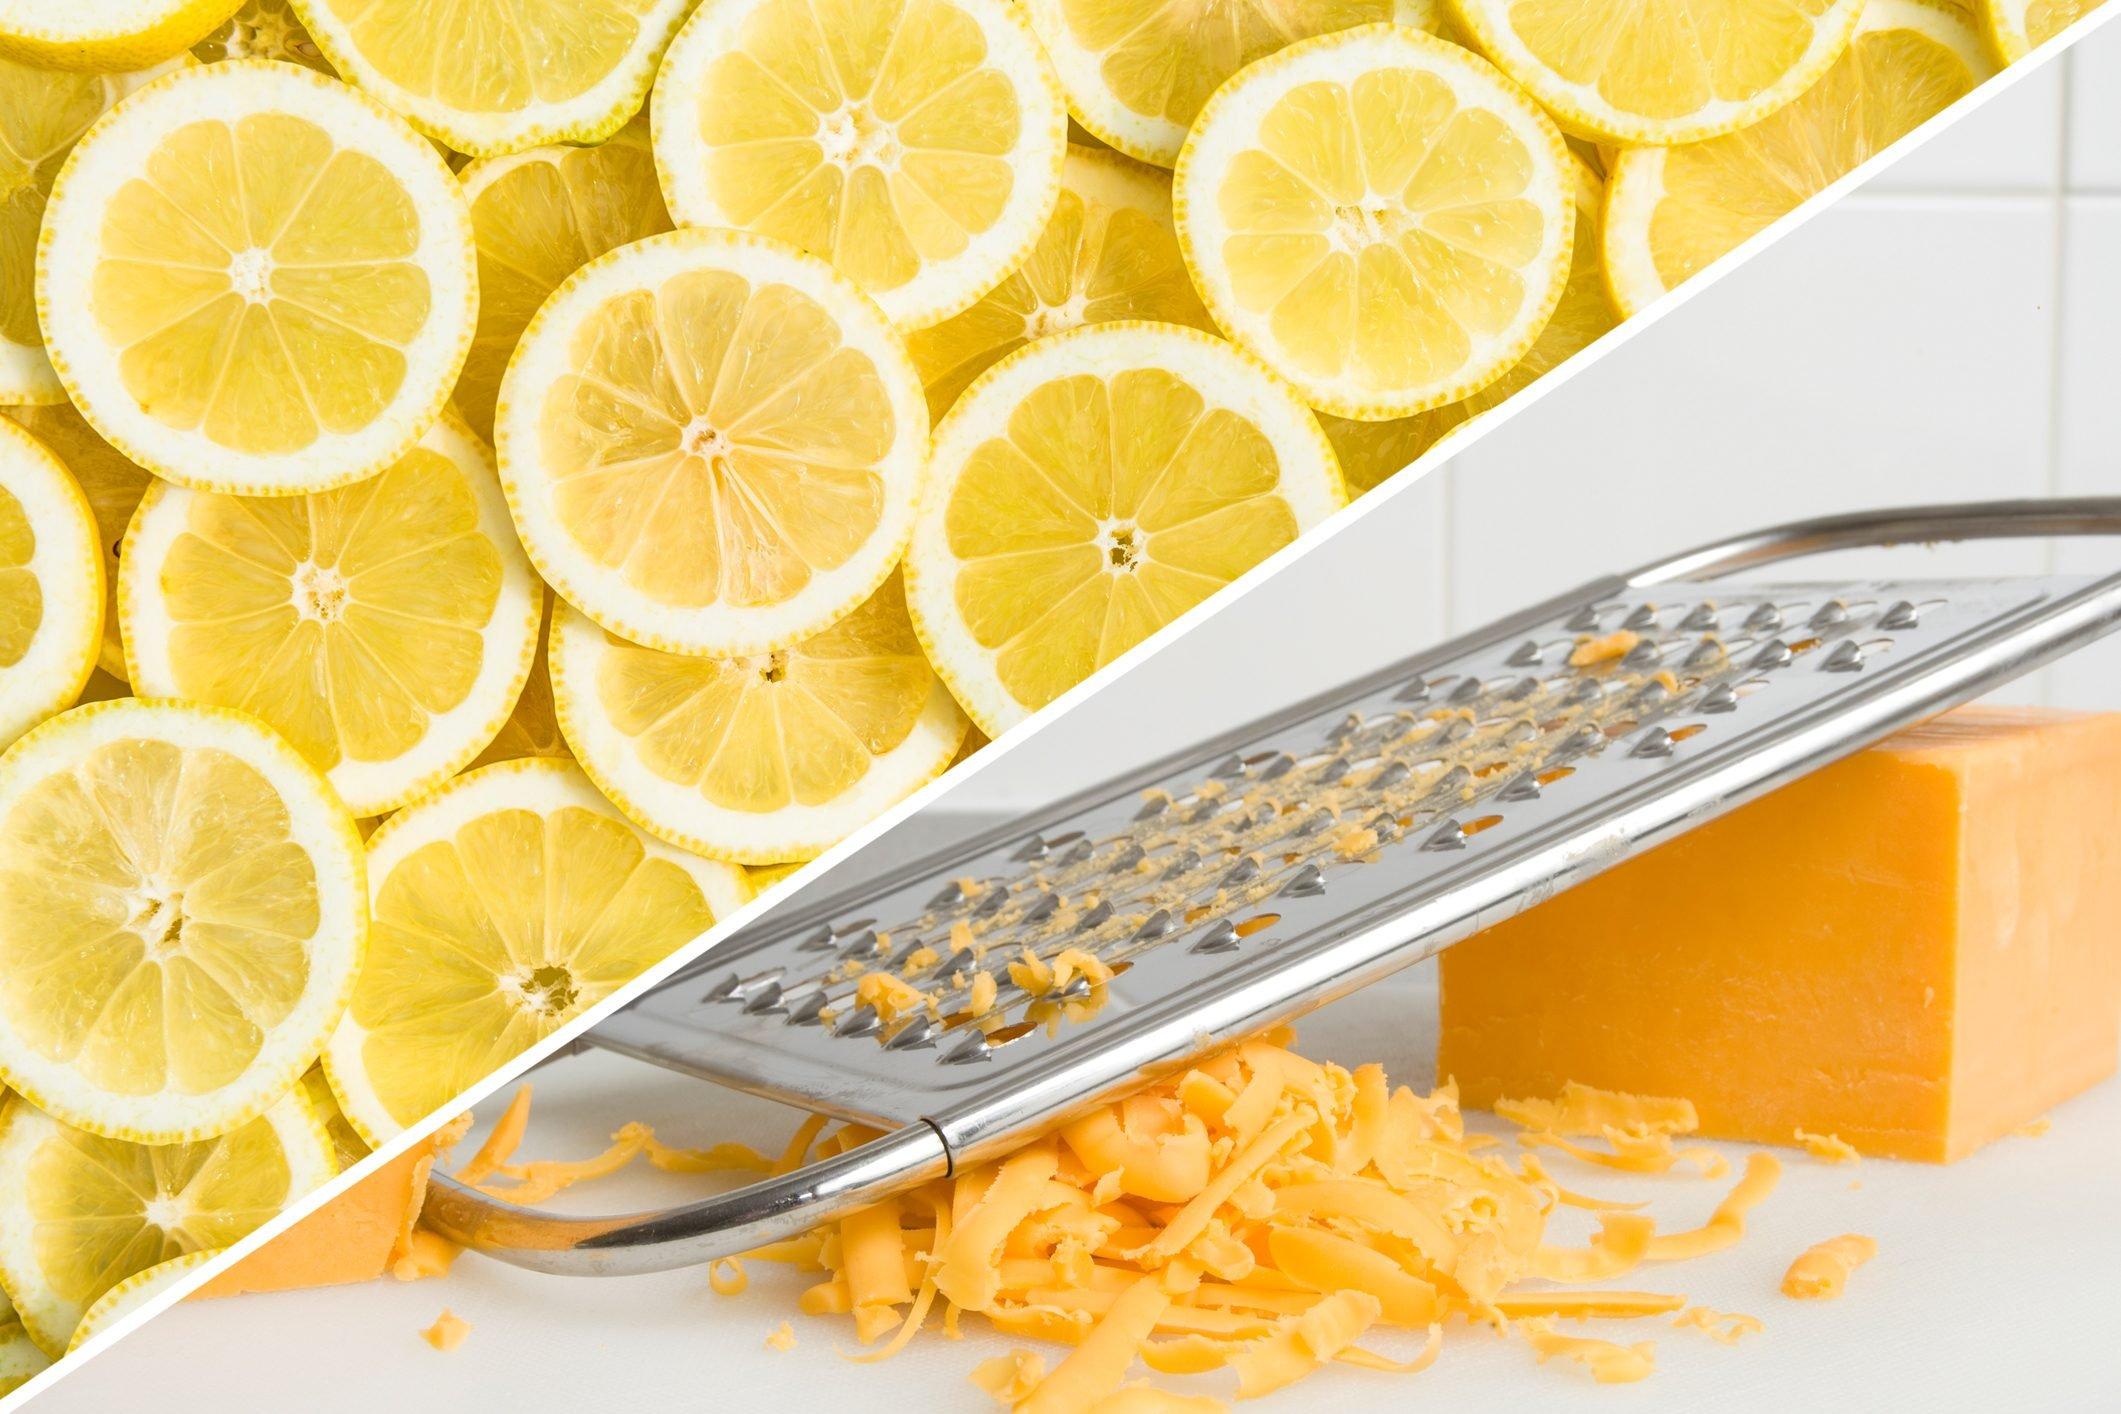 cheese grater lemon cleaner